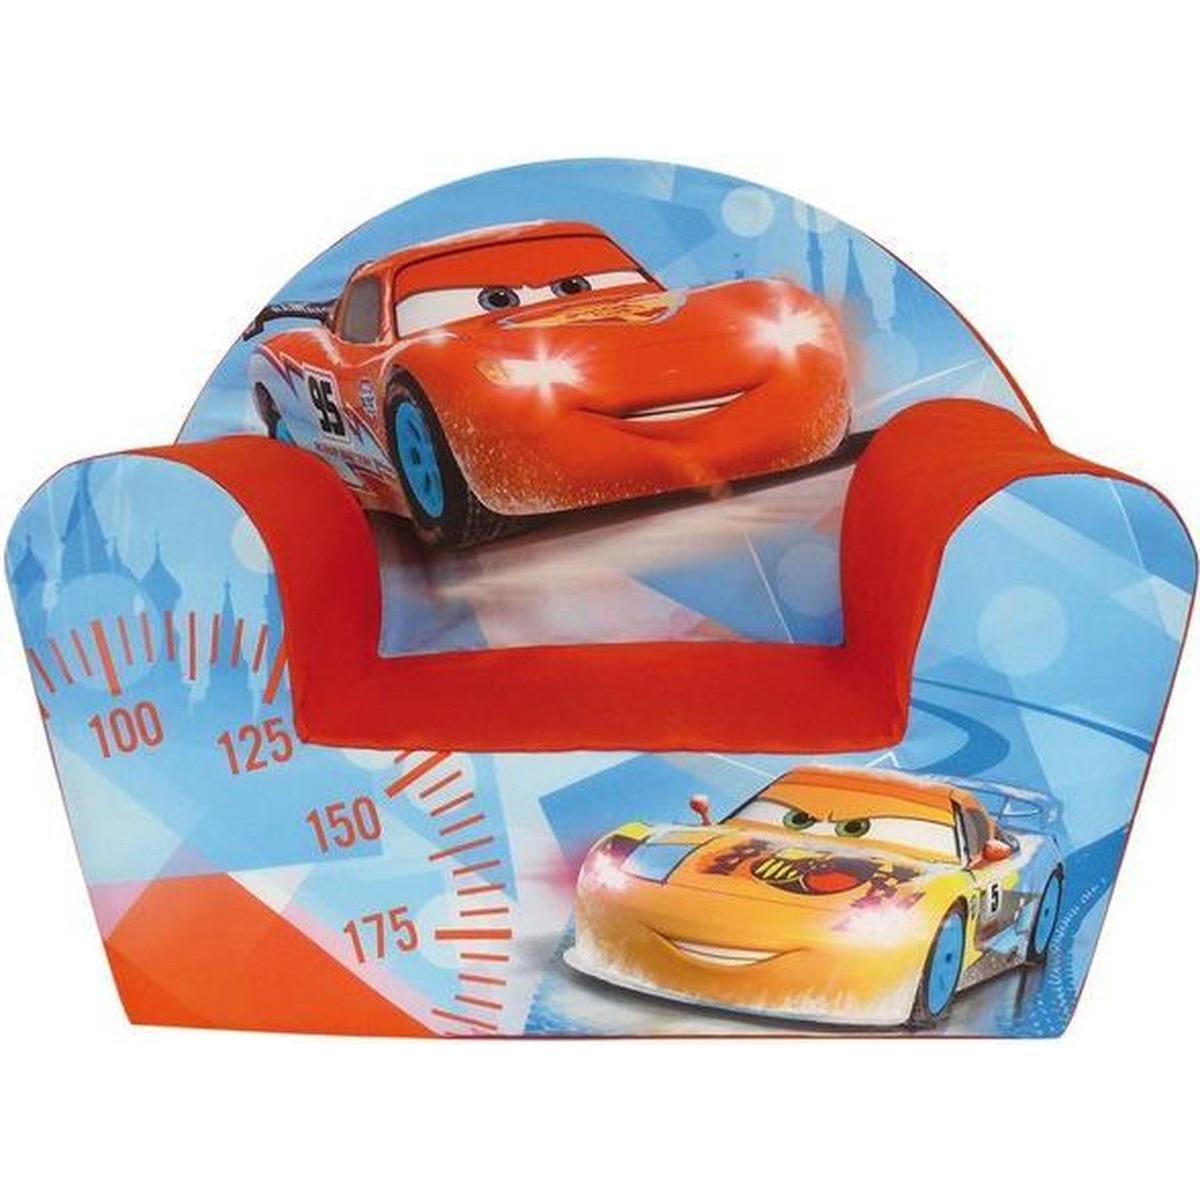 Disney Cars kinderstoel-kinderfauteuil 33 x 52 x 42 cm kindermeubels